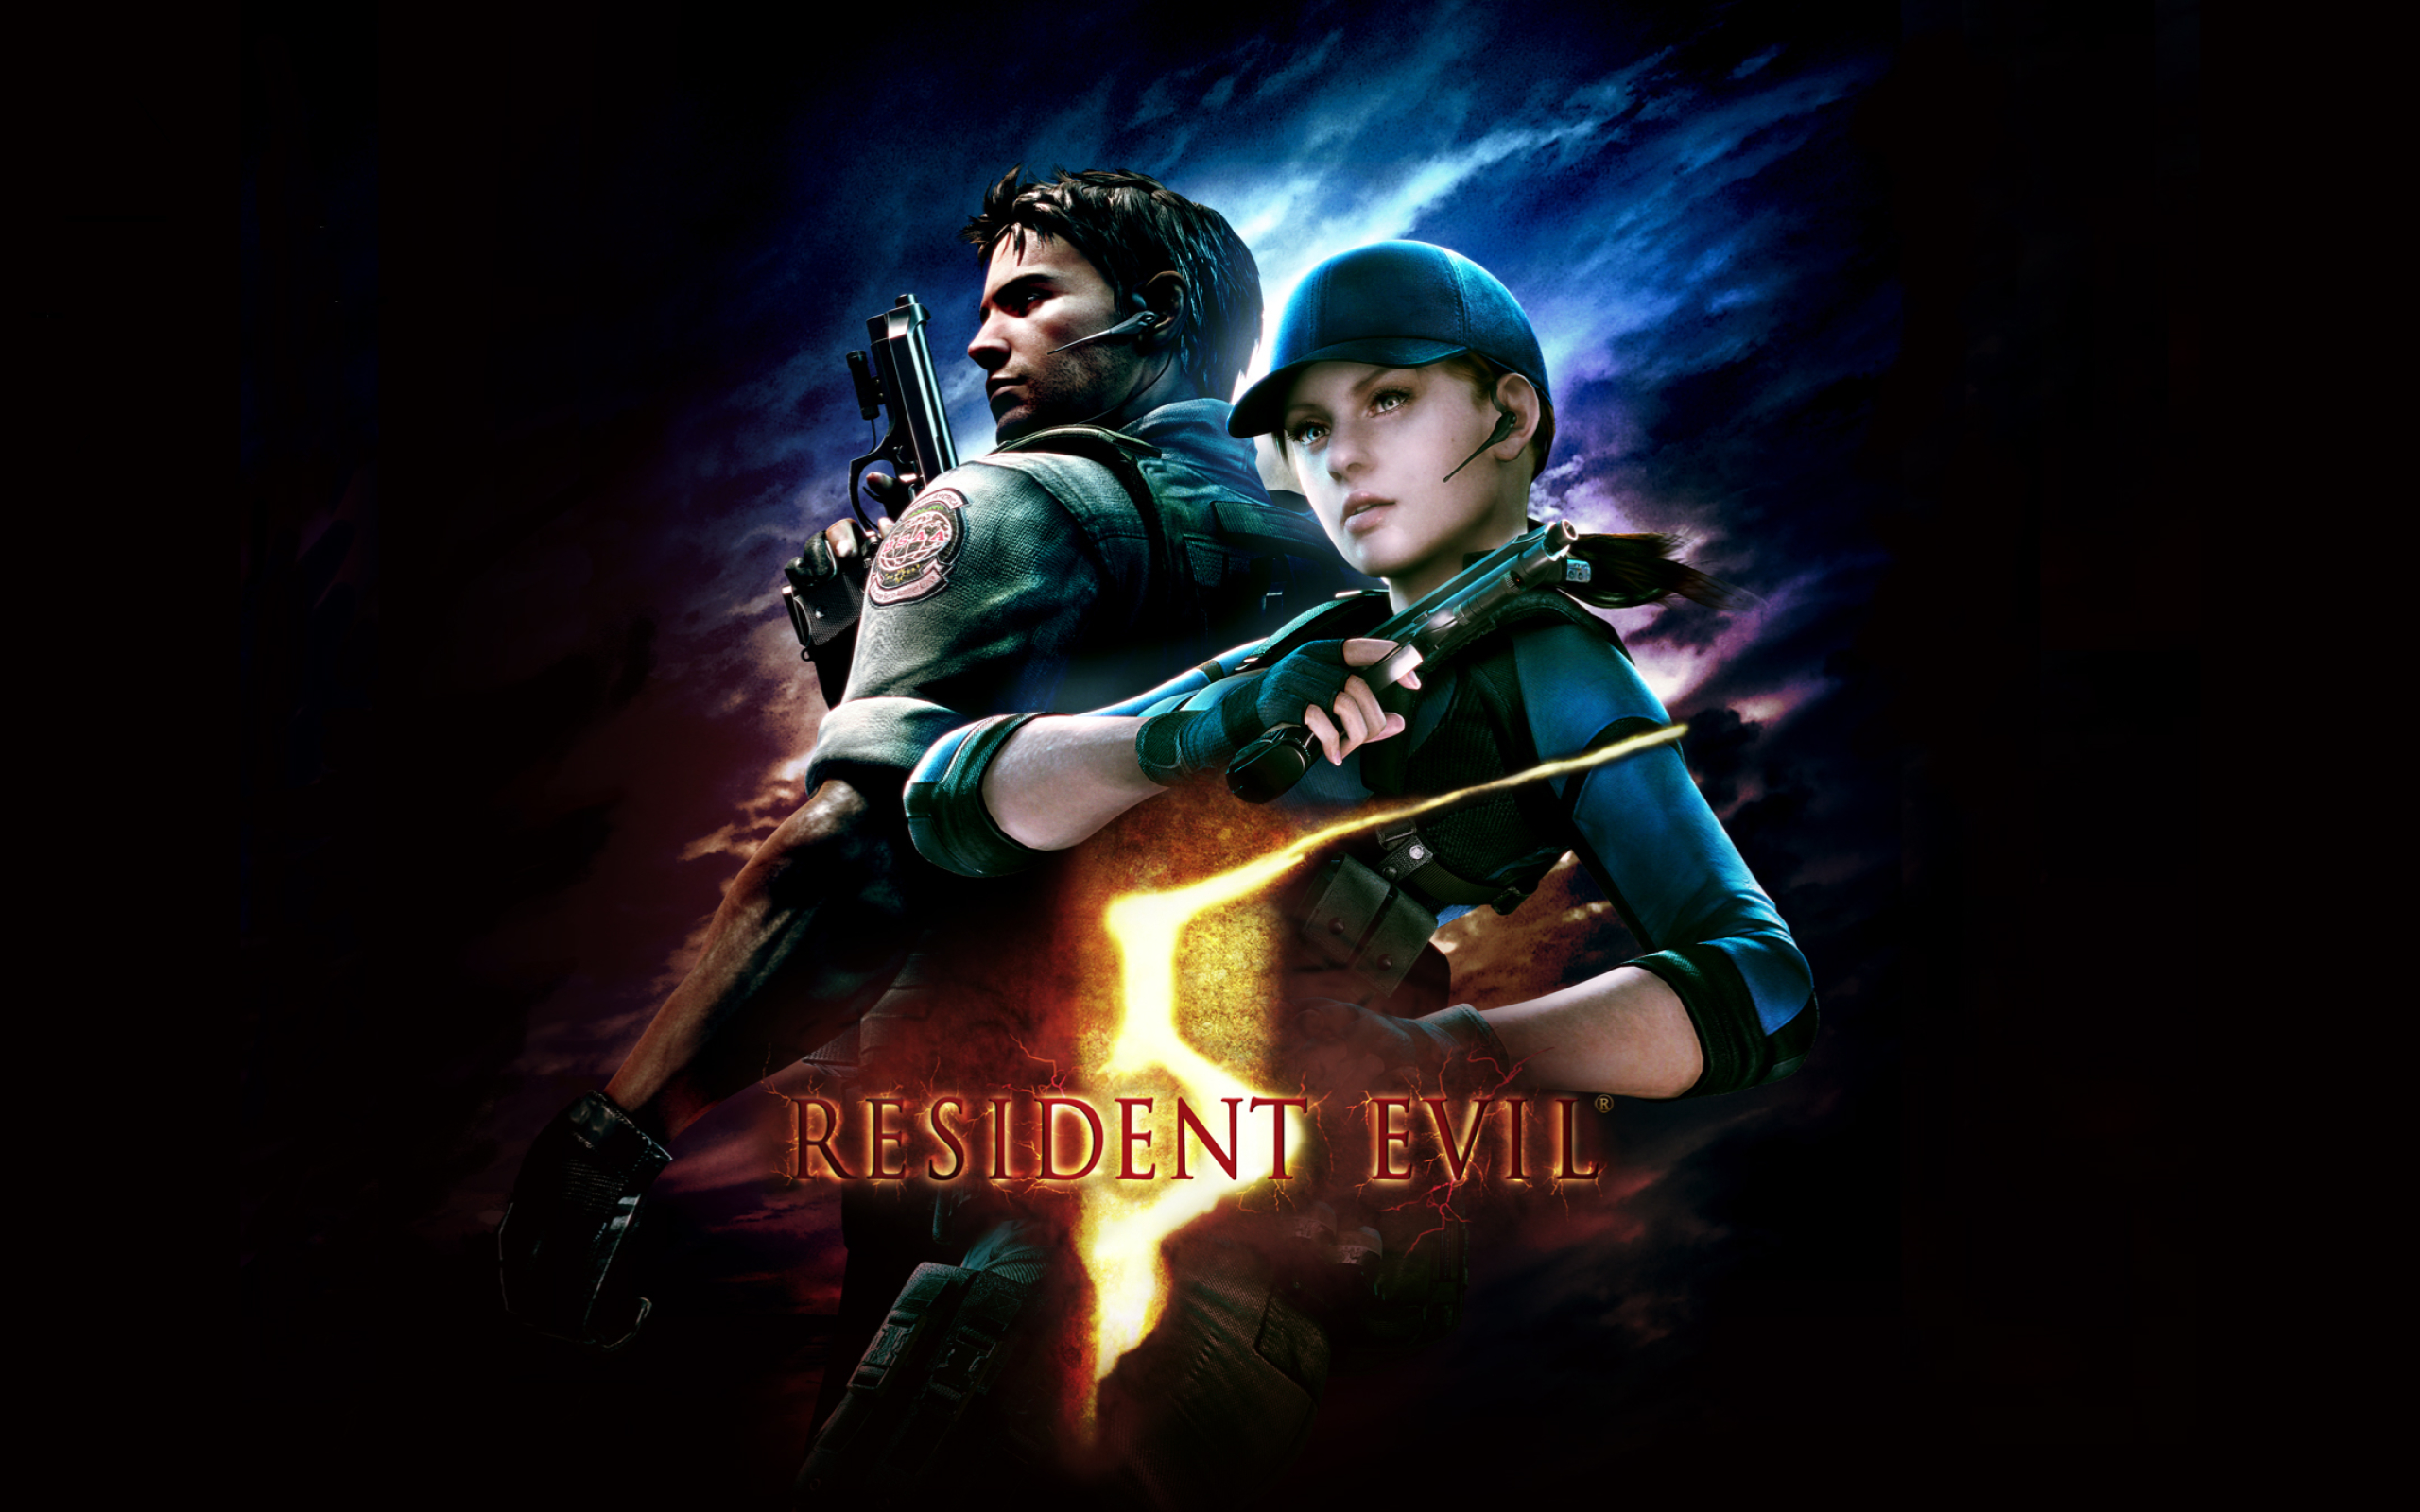 2560x1600 Resident Evil 5 2560x1600 Resolution Wallpaper Hd Games